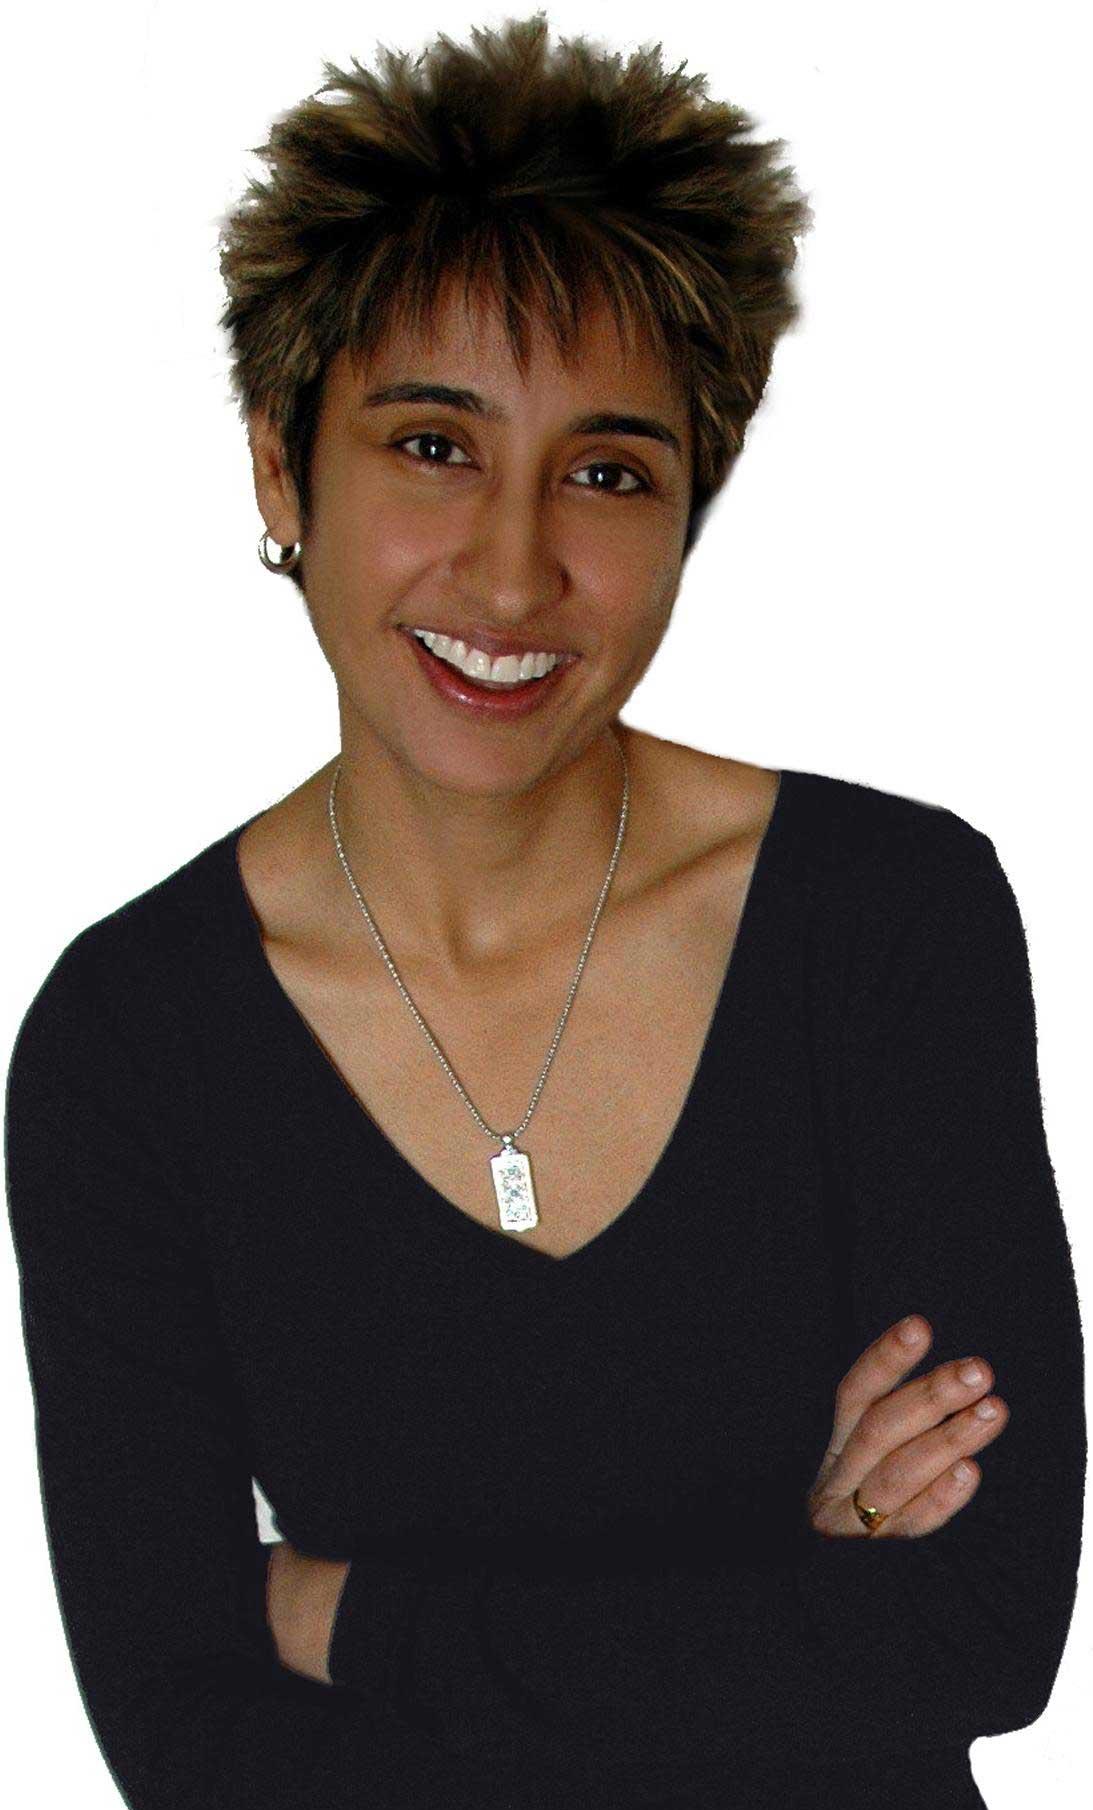 Irshad Manji (Photo by Raquel Saraswati via Wikimedia Commons)